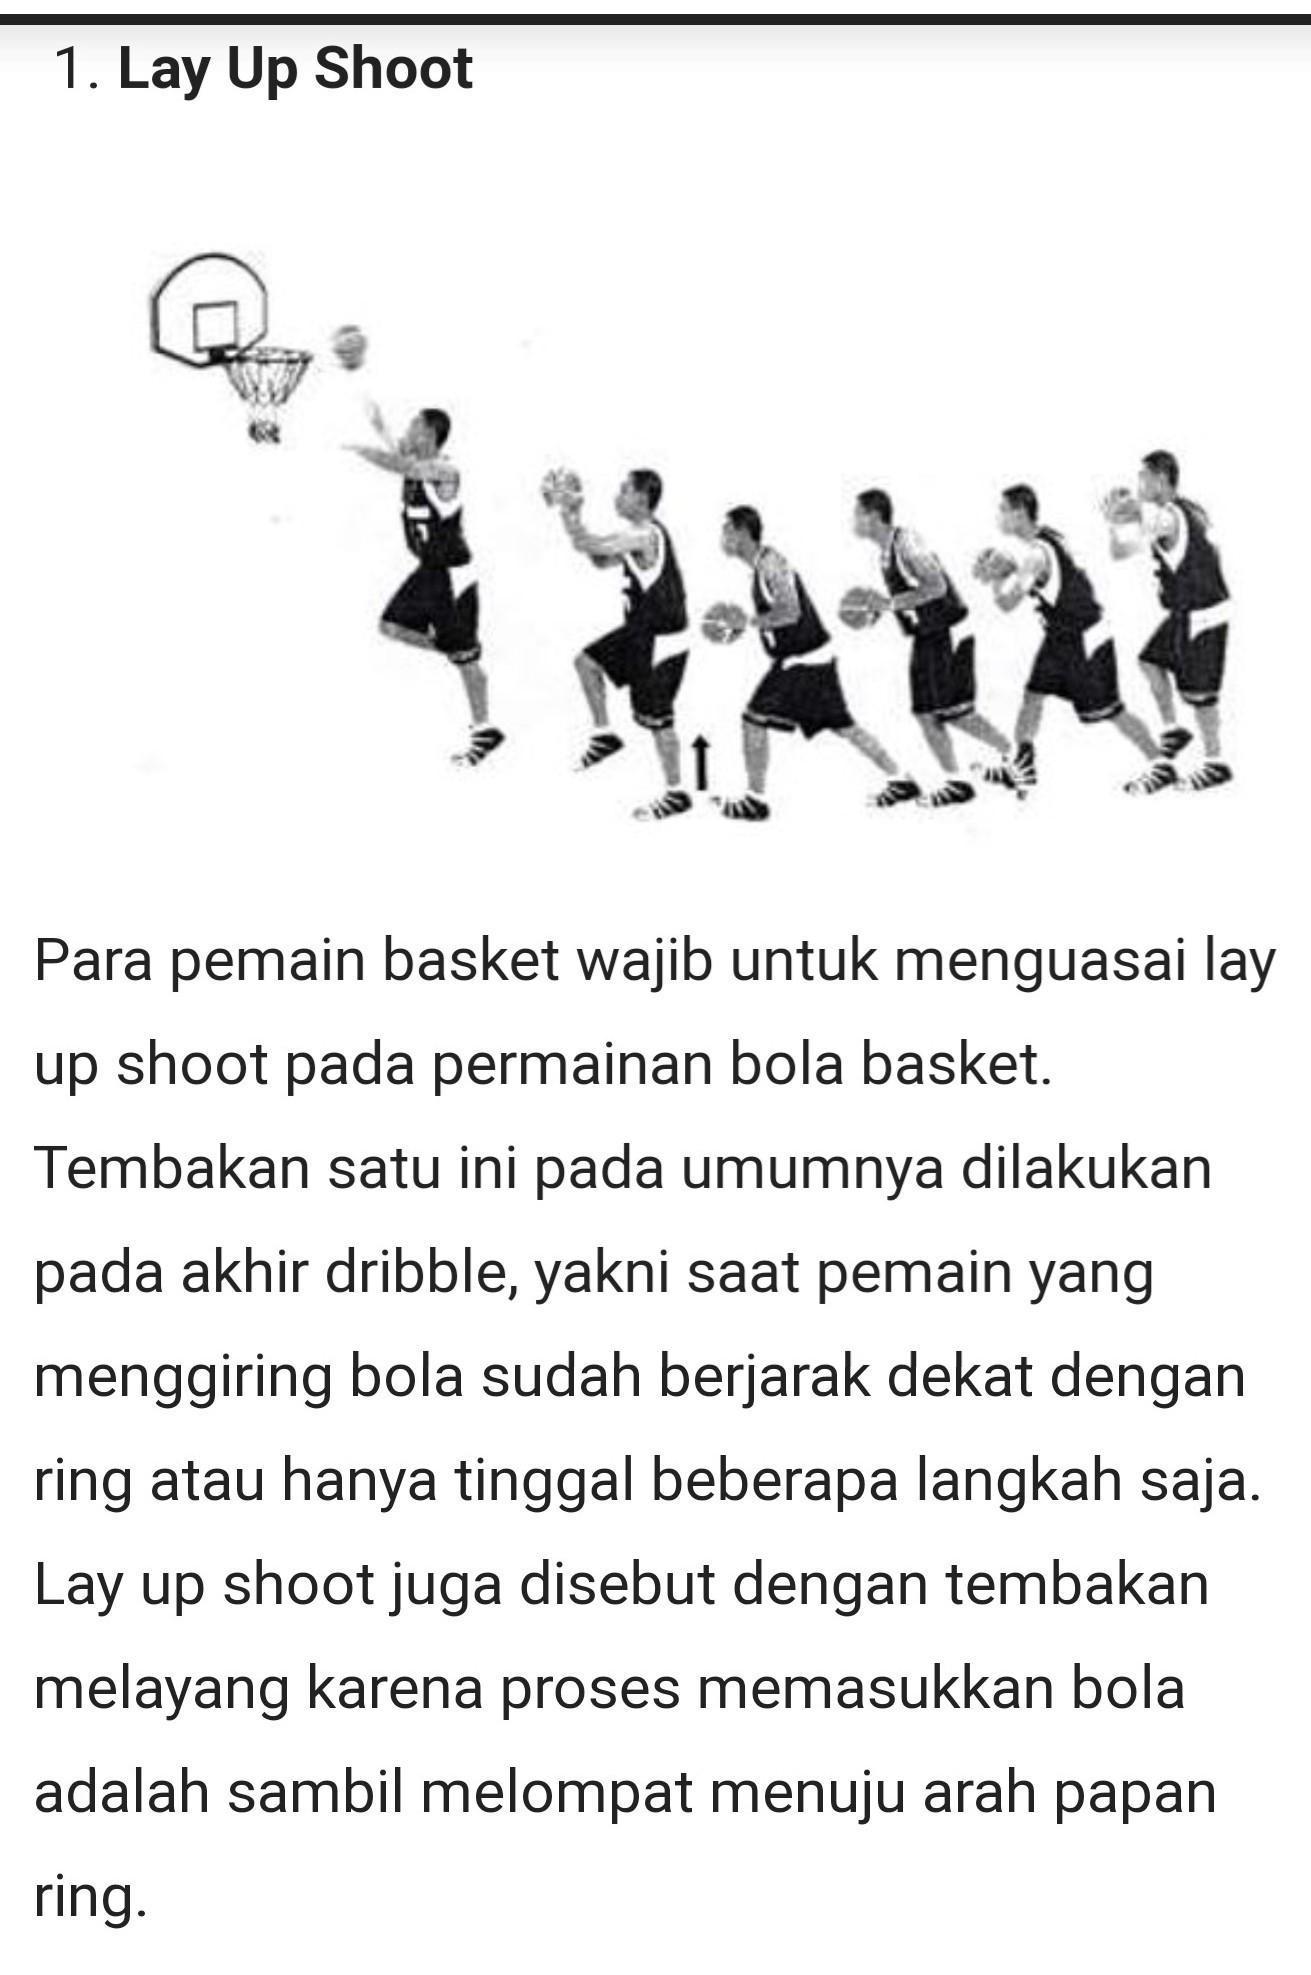 Eh Tembakan Bola Basket Sambil Melompat Dengan Posisi Dekat Dgn Ring Tu Lay Up Apa Jump Shoot Plis Brainly Co Id